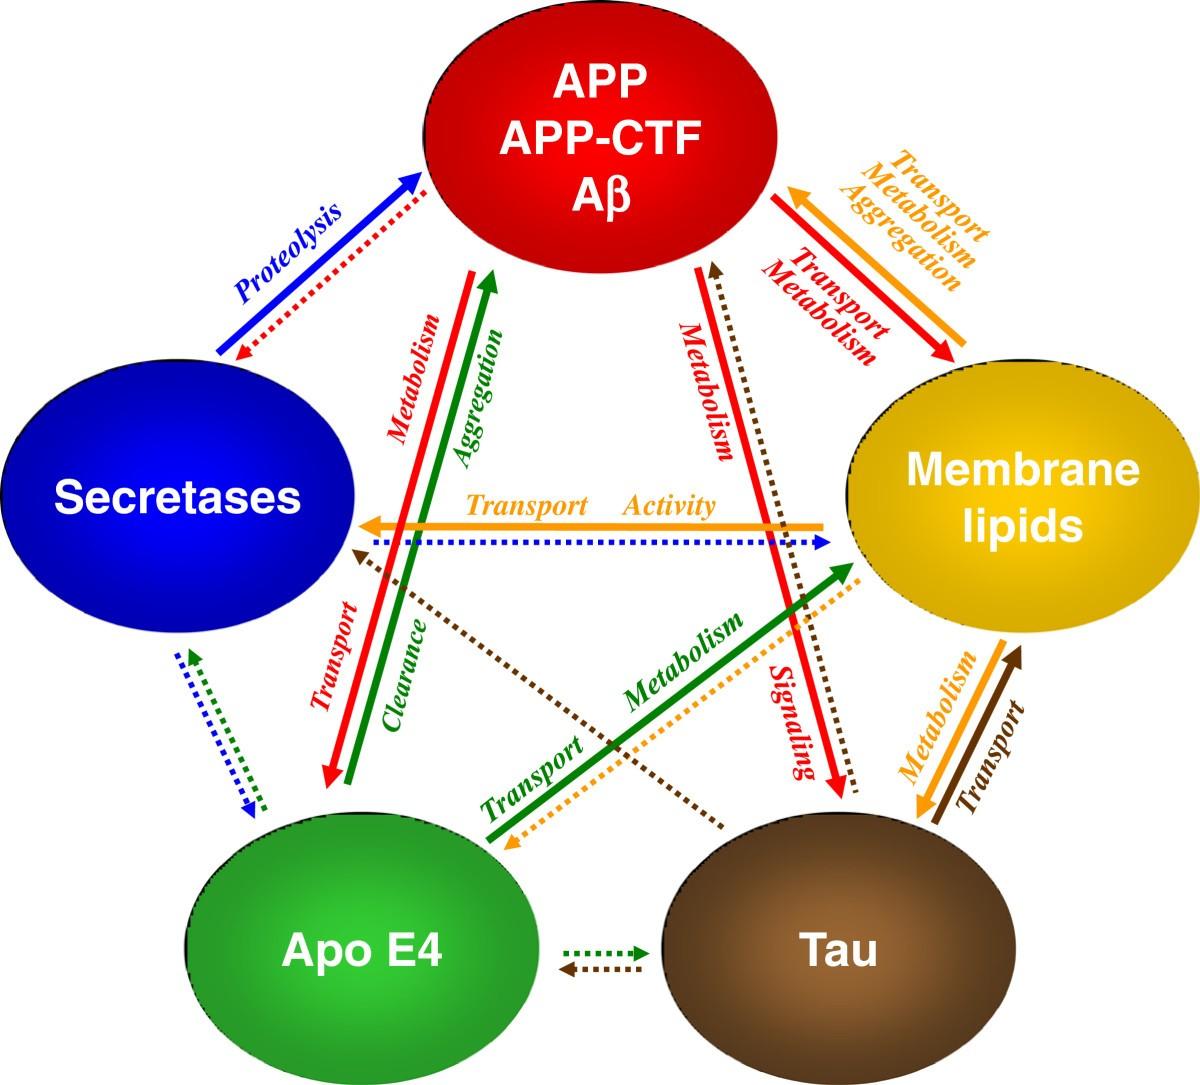 Cross-talk Of Membrane Lipids And Alzheimer-related